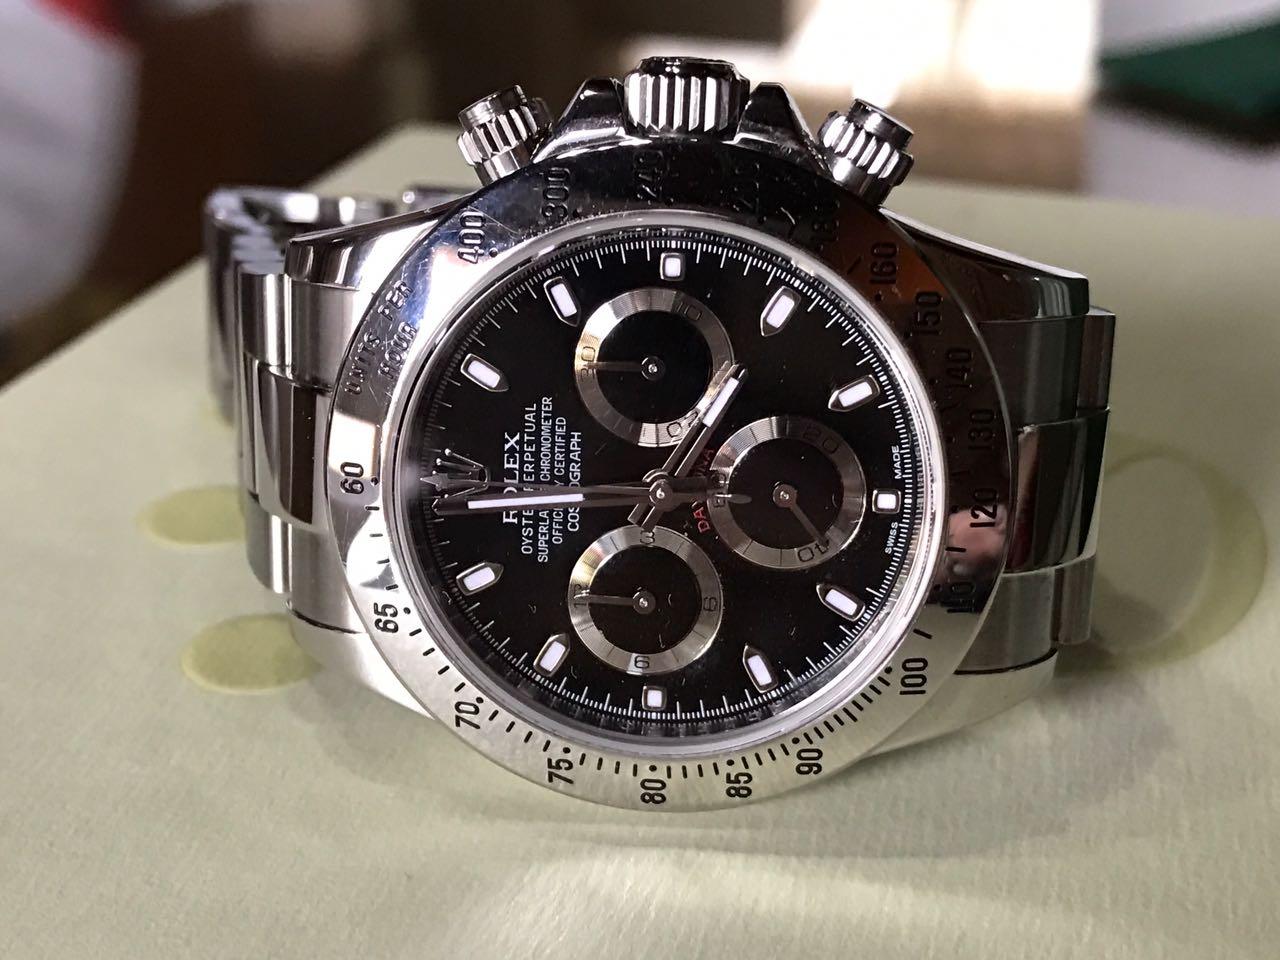 25bdfad3a85 Hong Kong Watch Fever 香港勞友  Rolex Daytona Ref 116520 On Sale